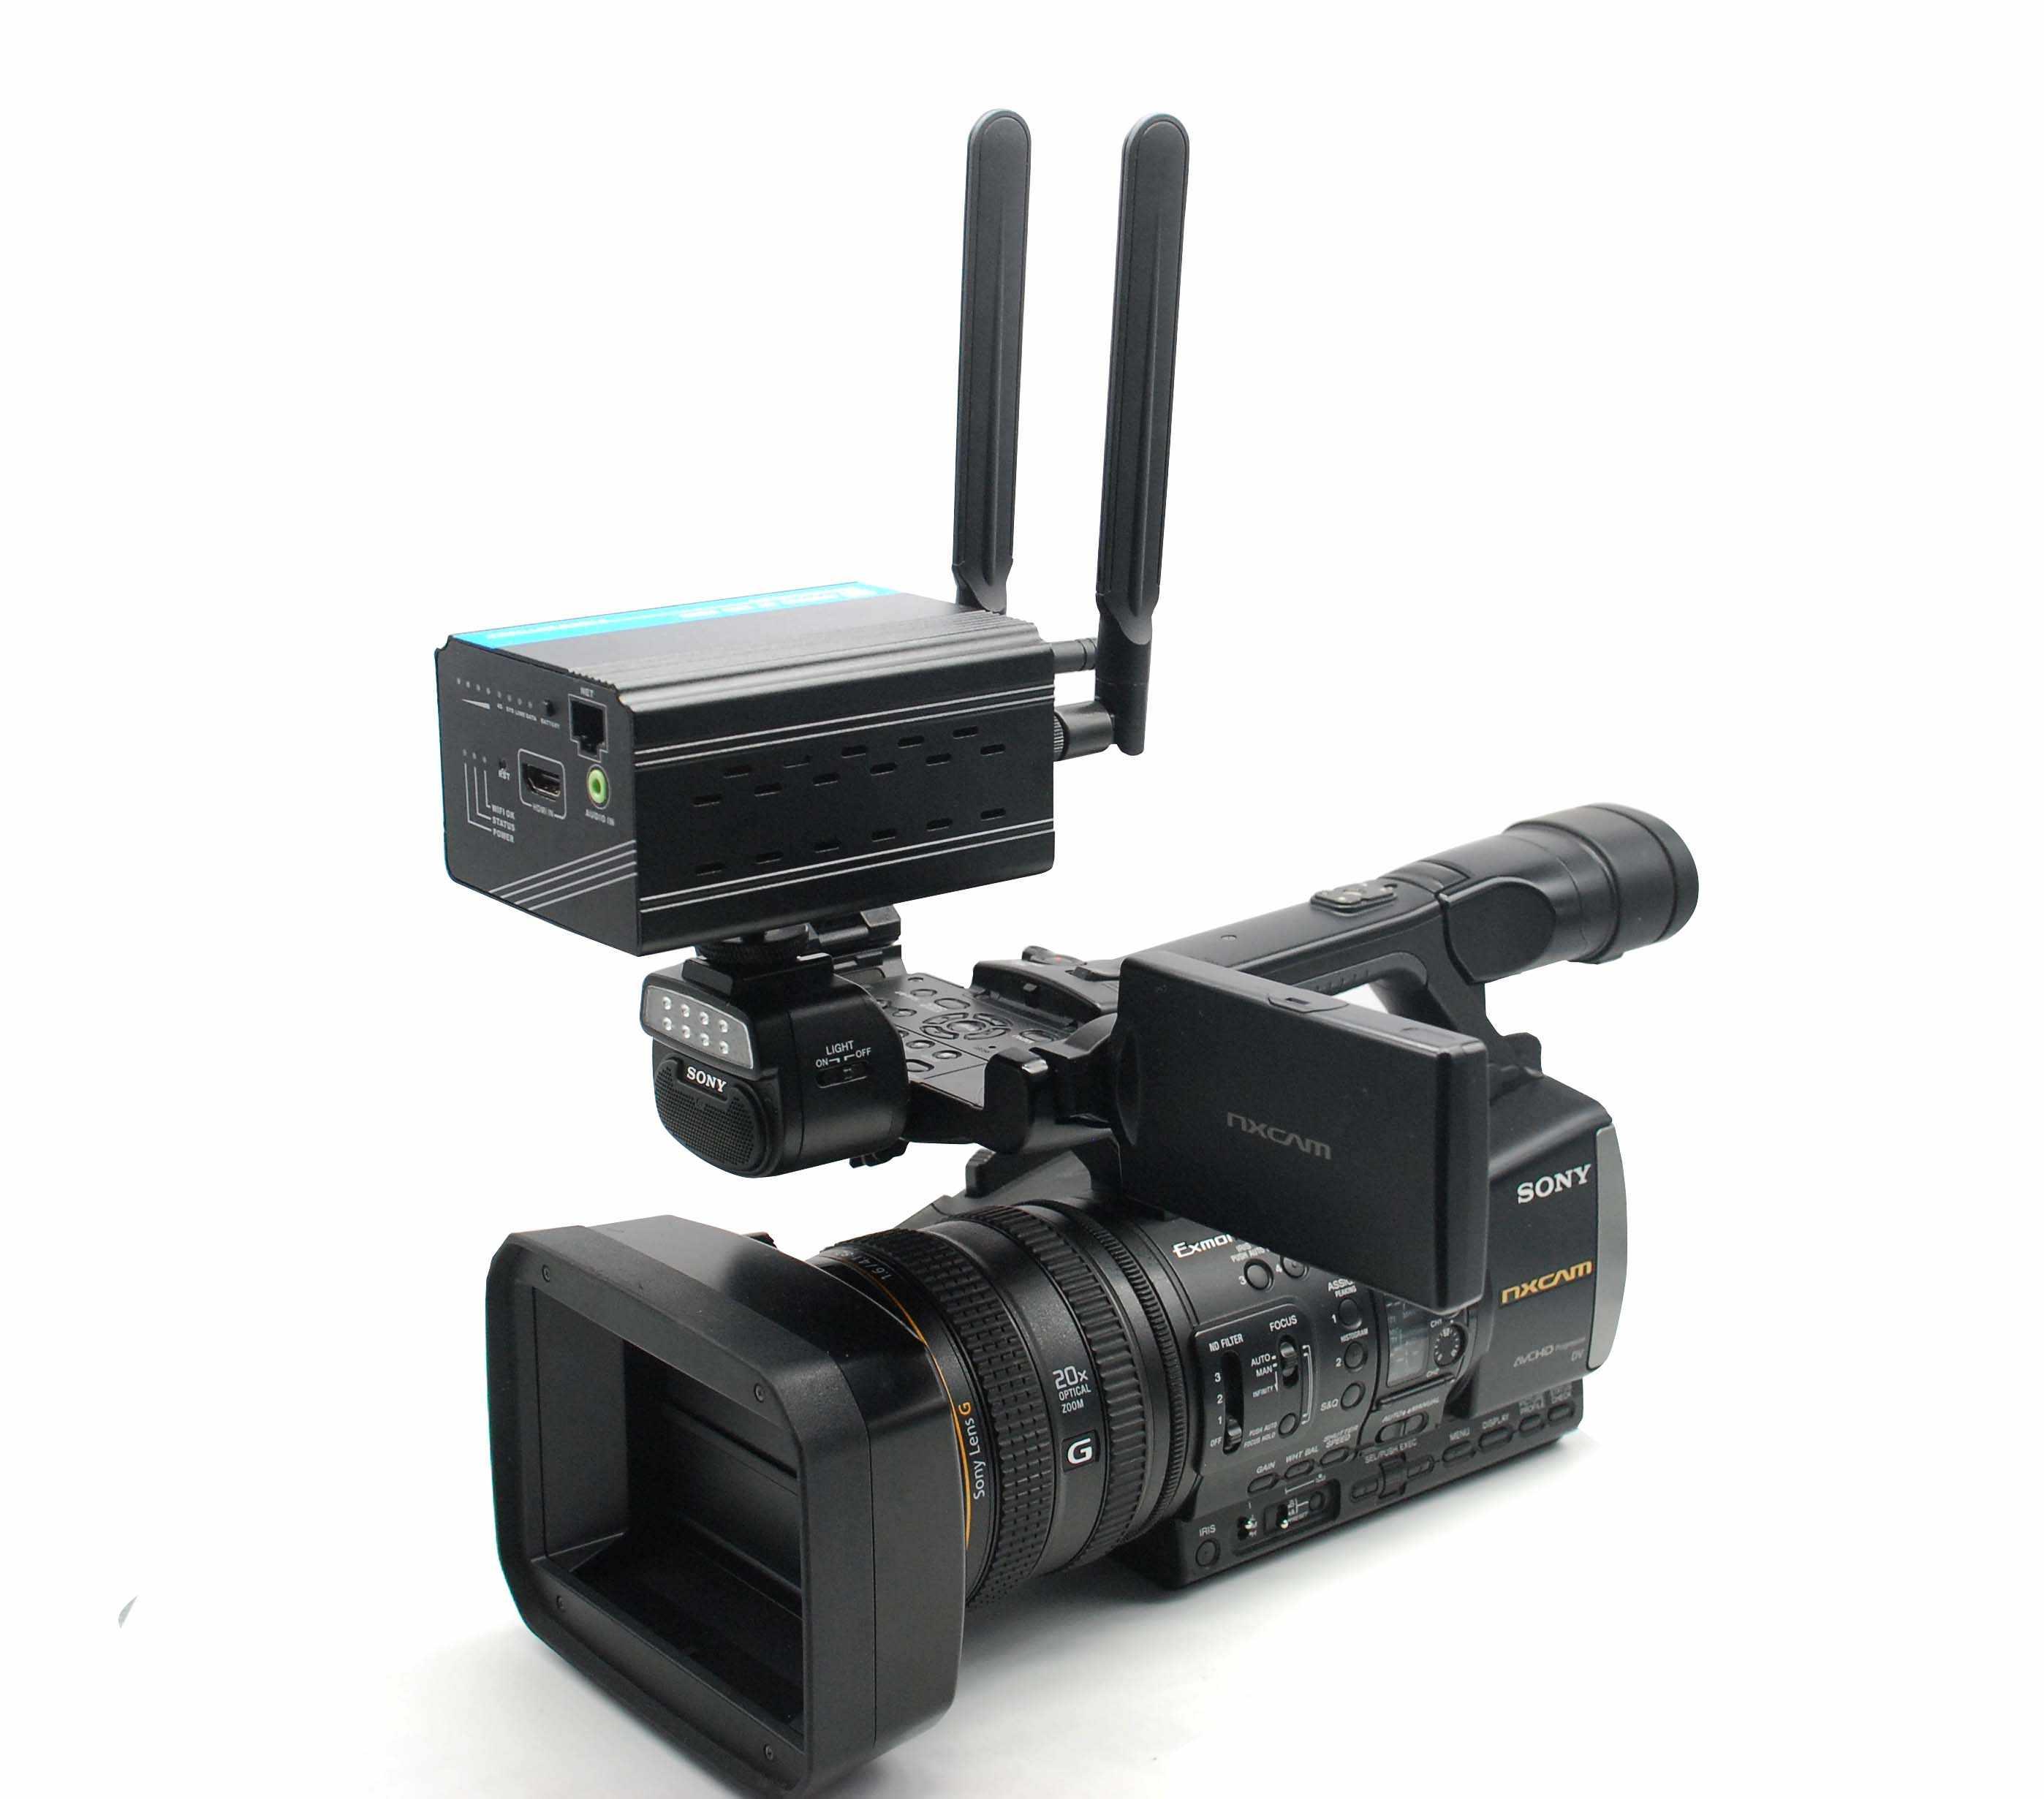 H264 h265 h 265 h 264 hdmi video rtmp ip encoder iptv for